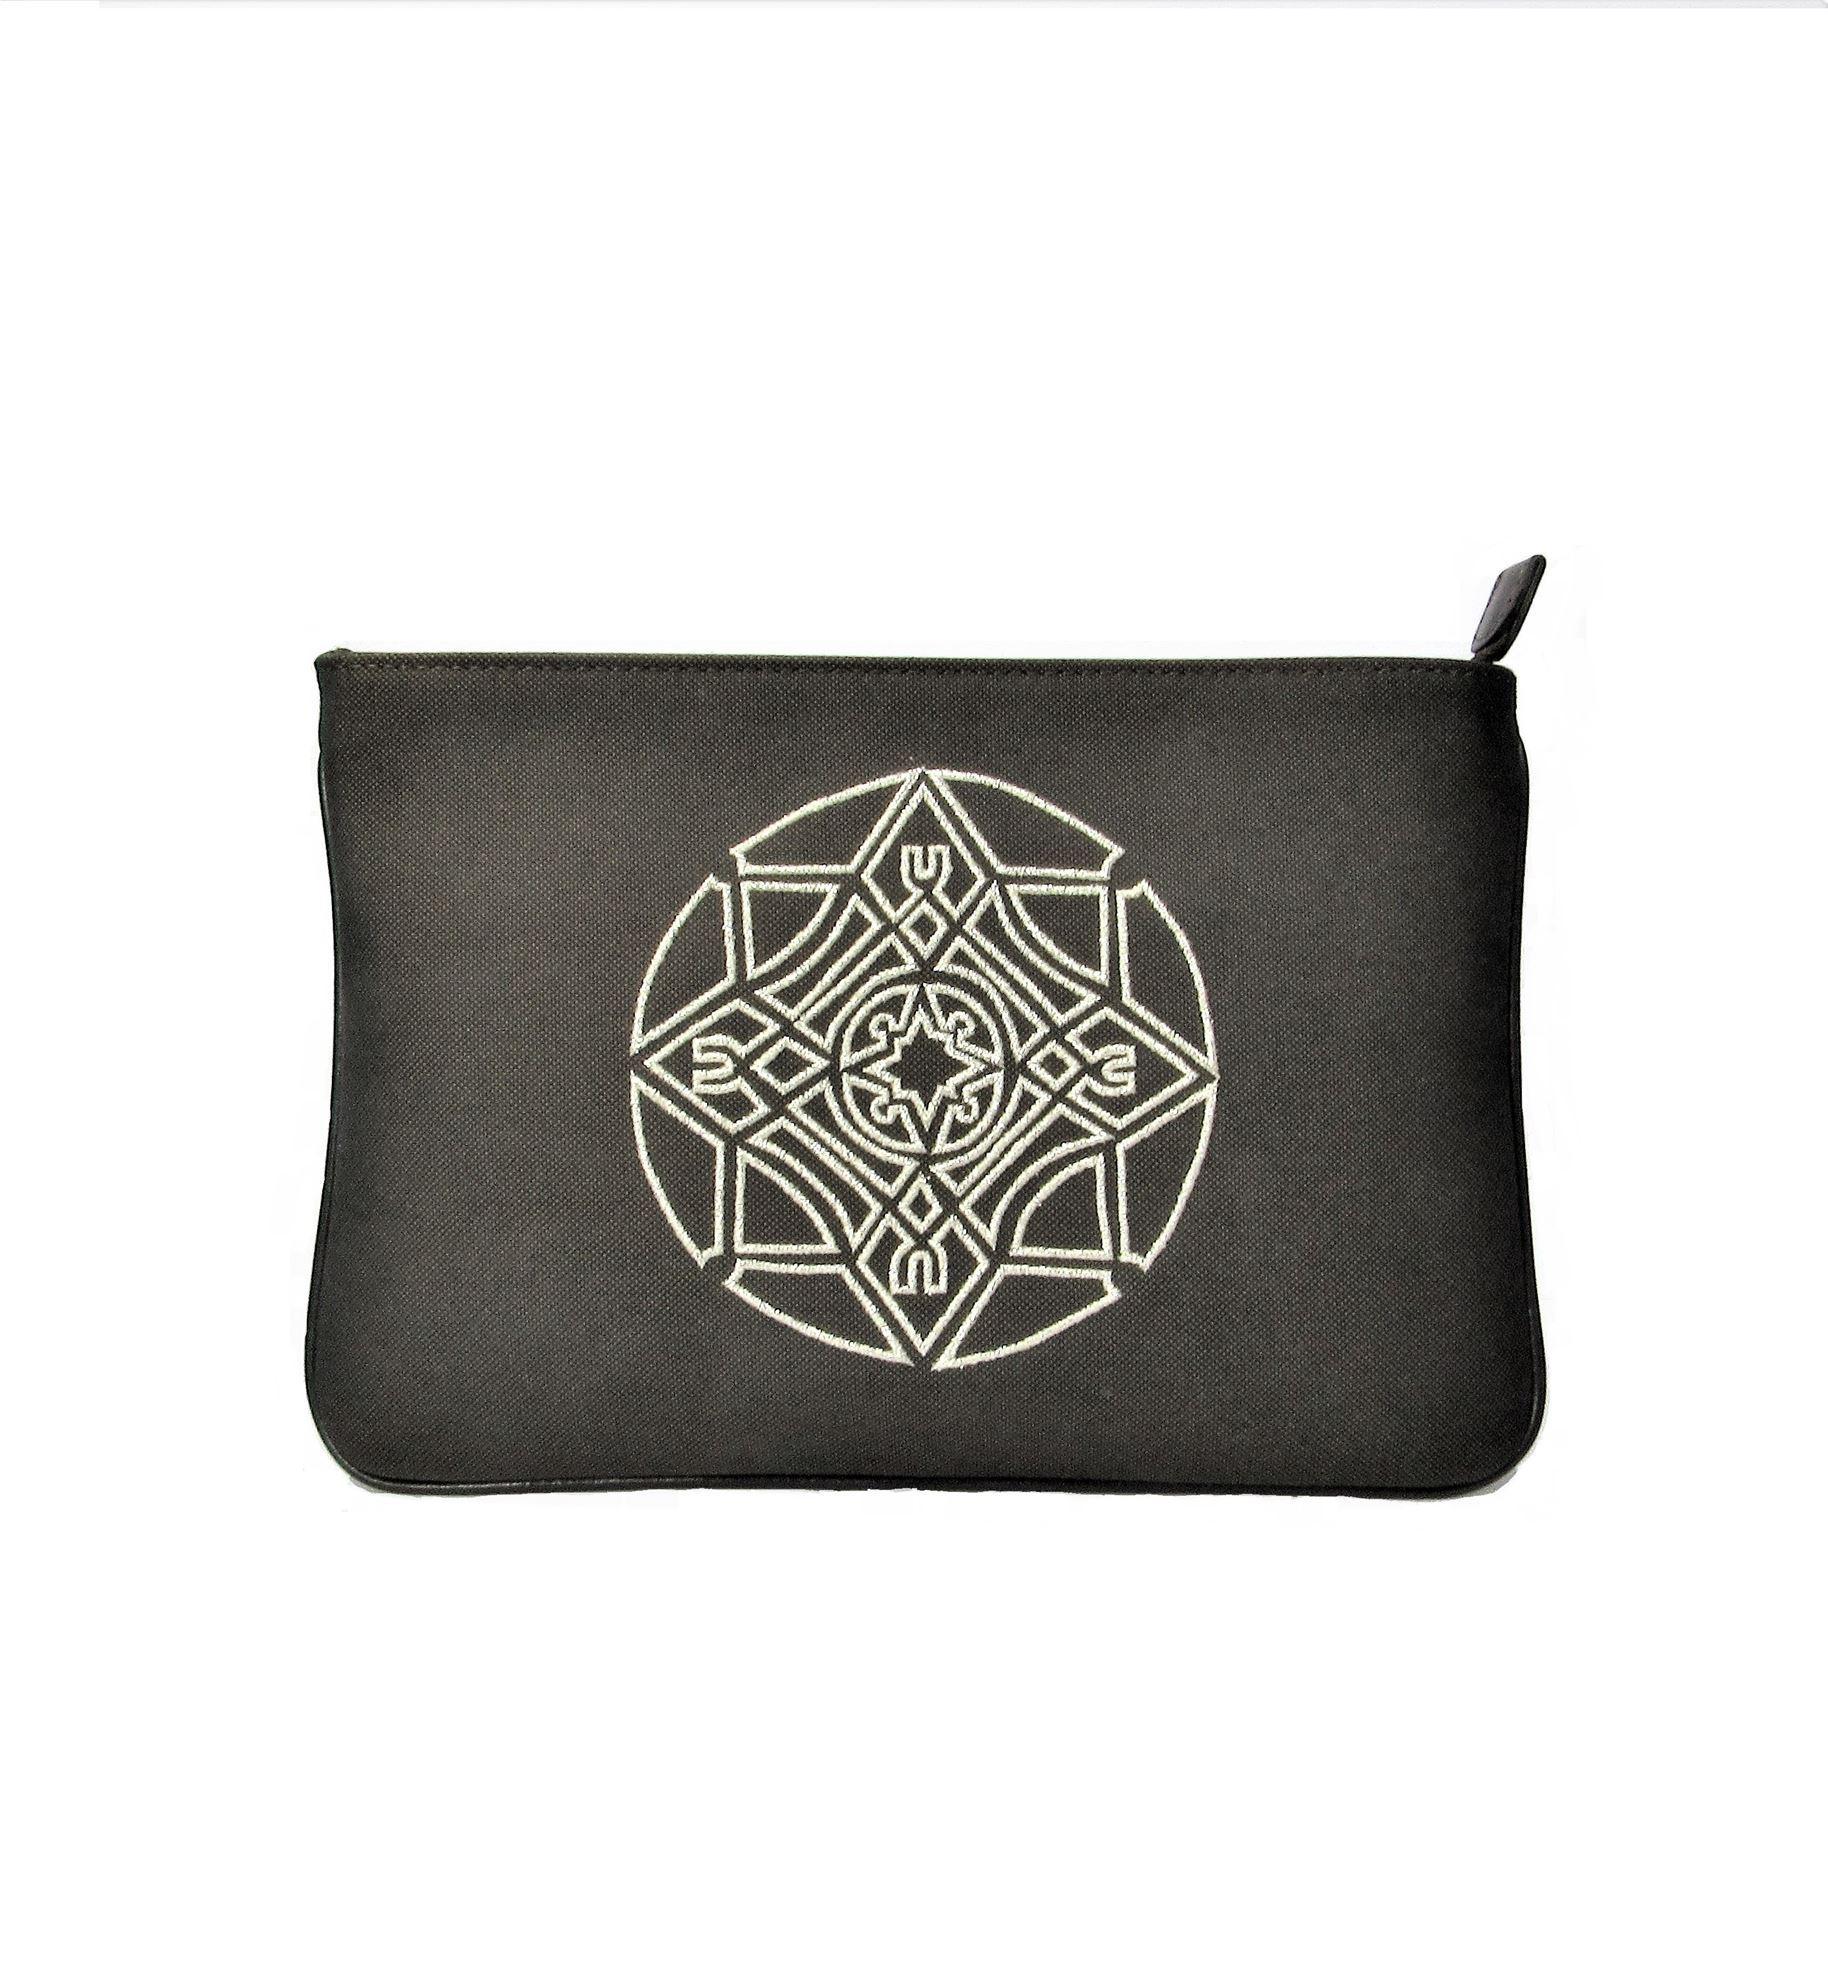 resm Mandala Clutch